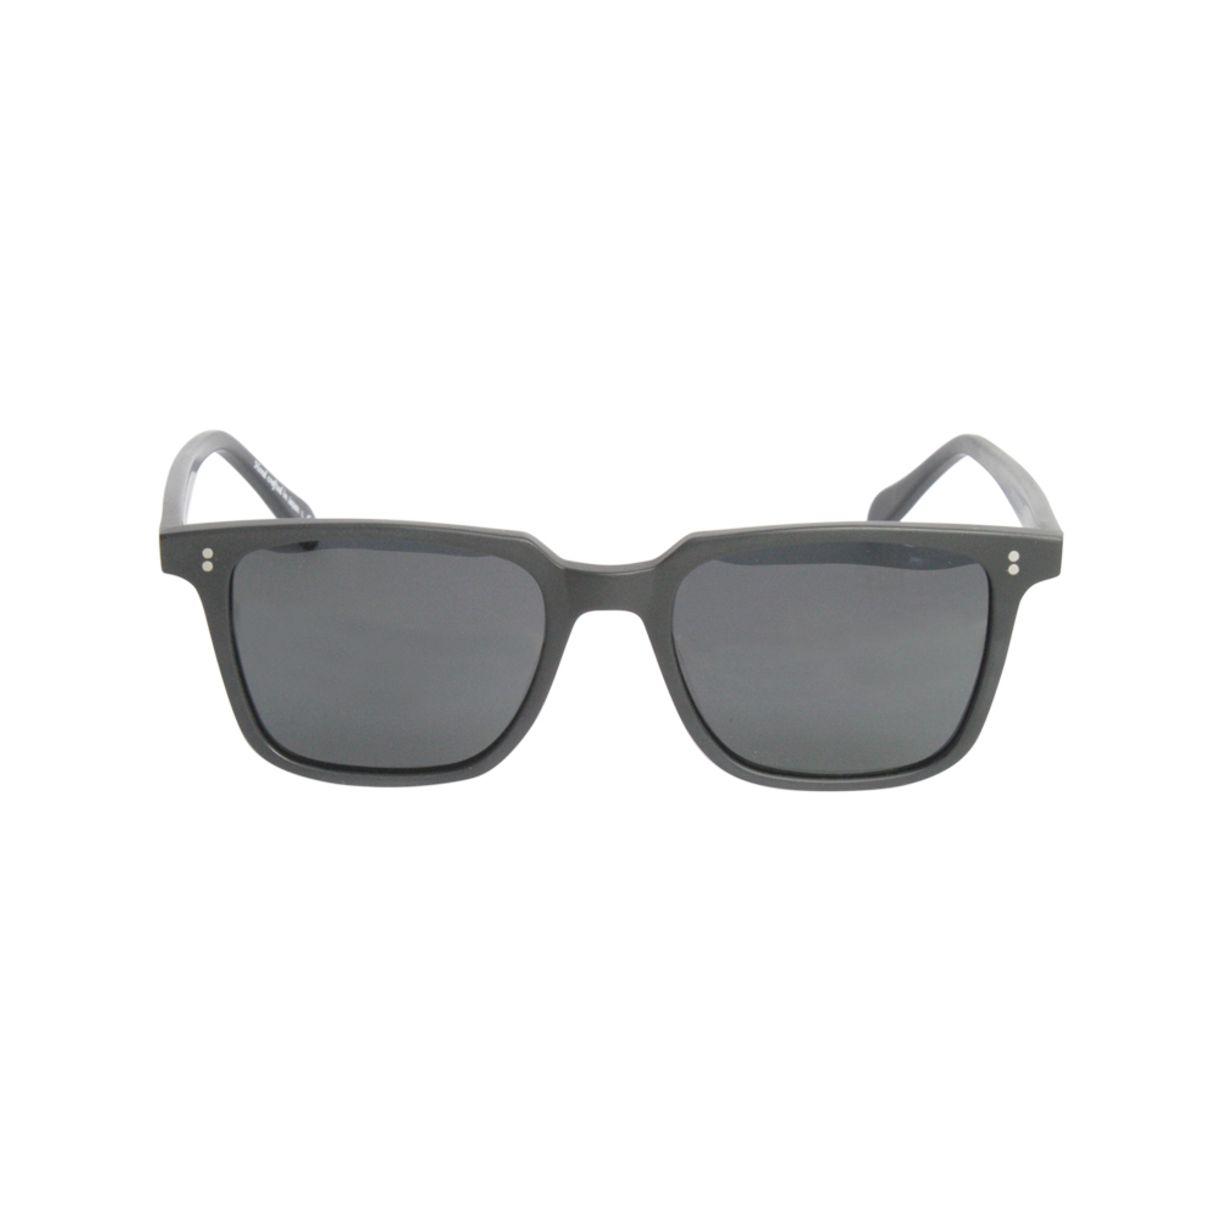 Oculos-Oliver-Peoples-NDG-P